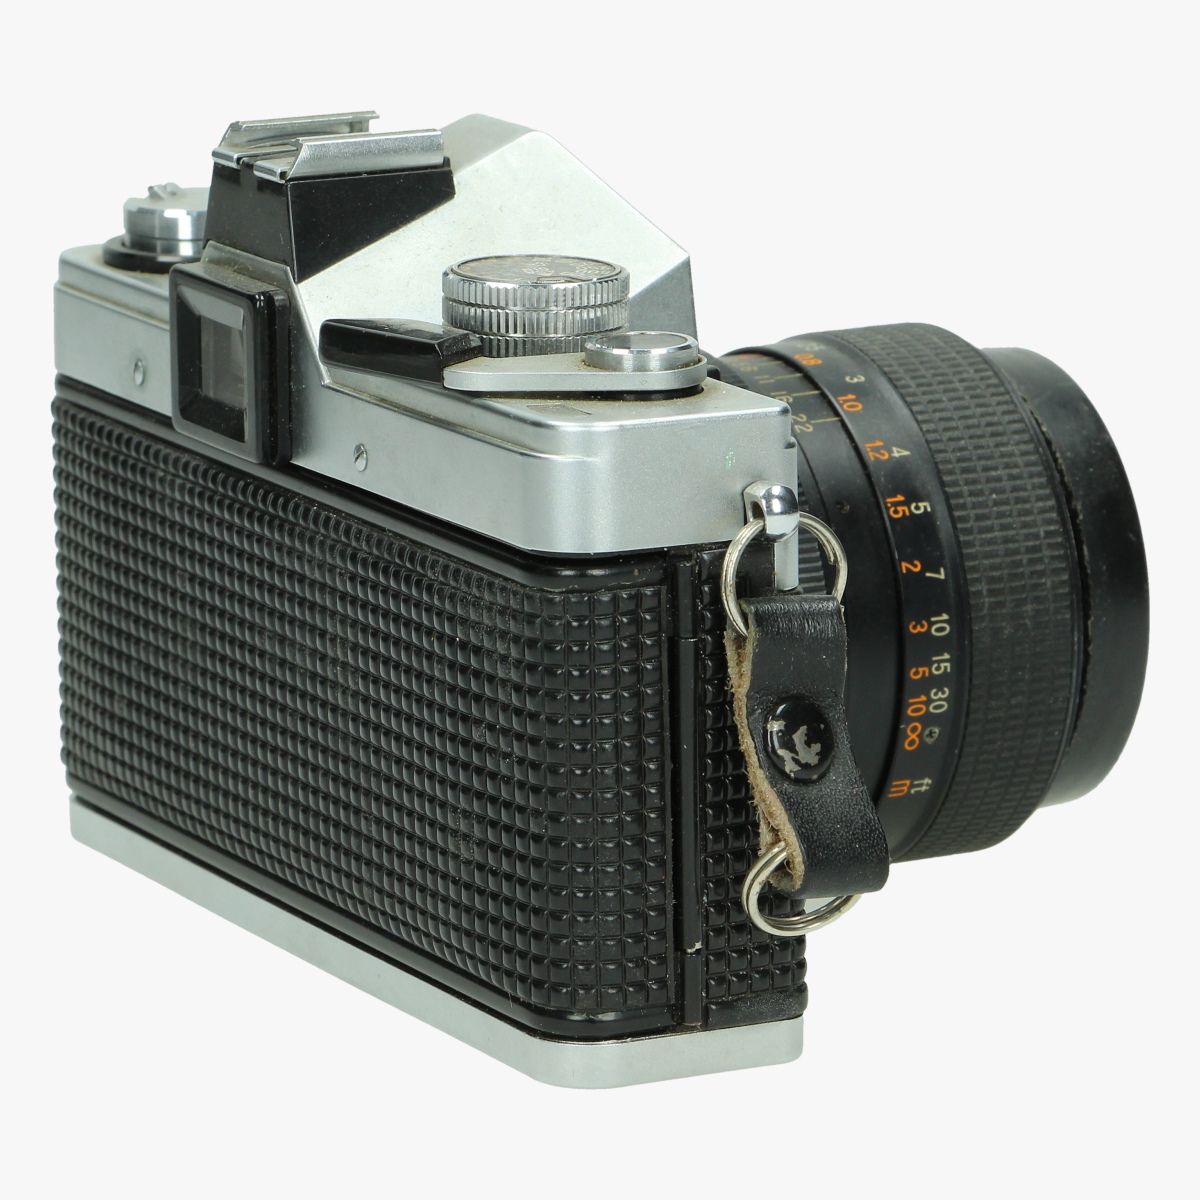 Afbeeldingen van fotocamera PRAKTICA SUPER TL 1000 pentacon made in Germany democratic republic